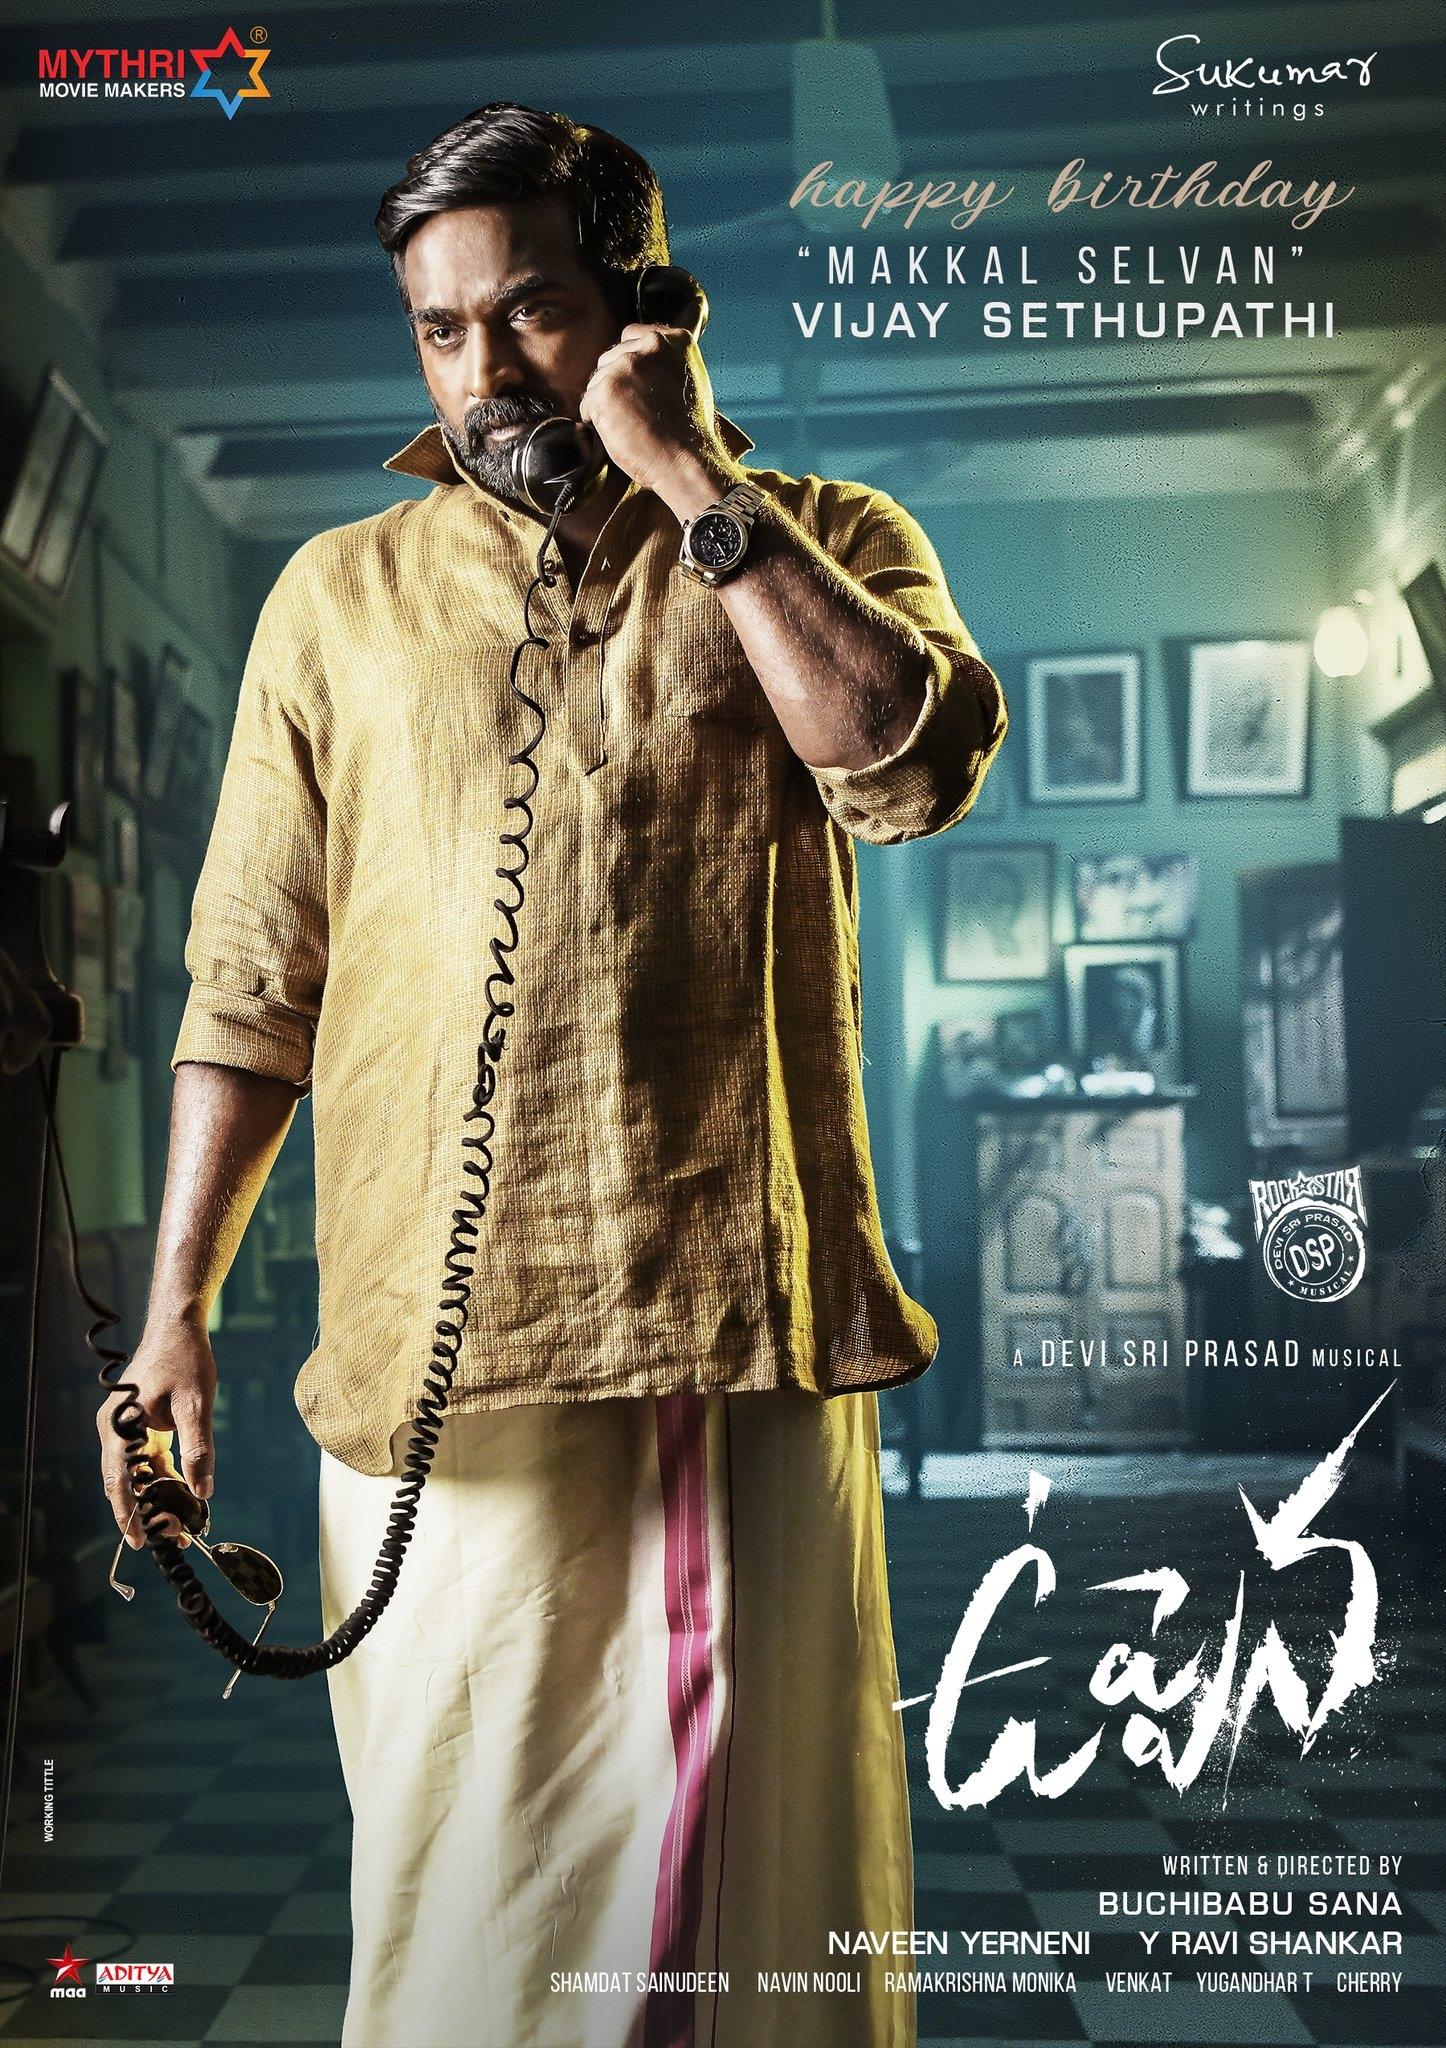 Vijay Sethupathi S Mass Look From Next Movie Rocks Internet Tamil News Indiaglitz Com Yaazha yaazha song promo _ vijay sethupathi _ shruthi hassan _ yuga bharathi _ d. next movie rocks internet tamil news